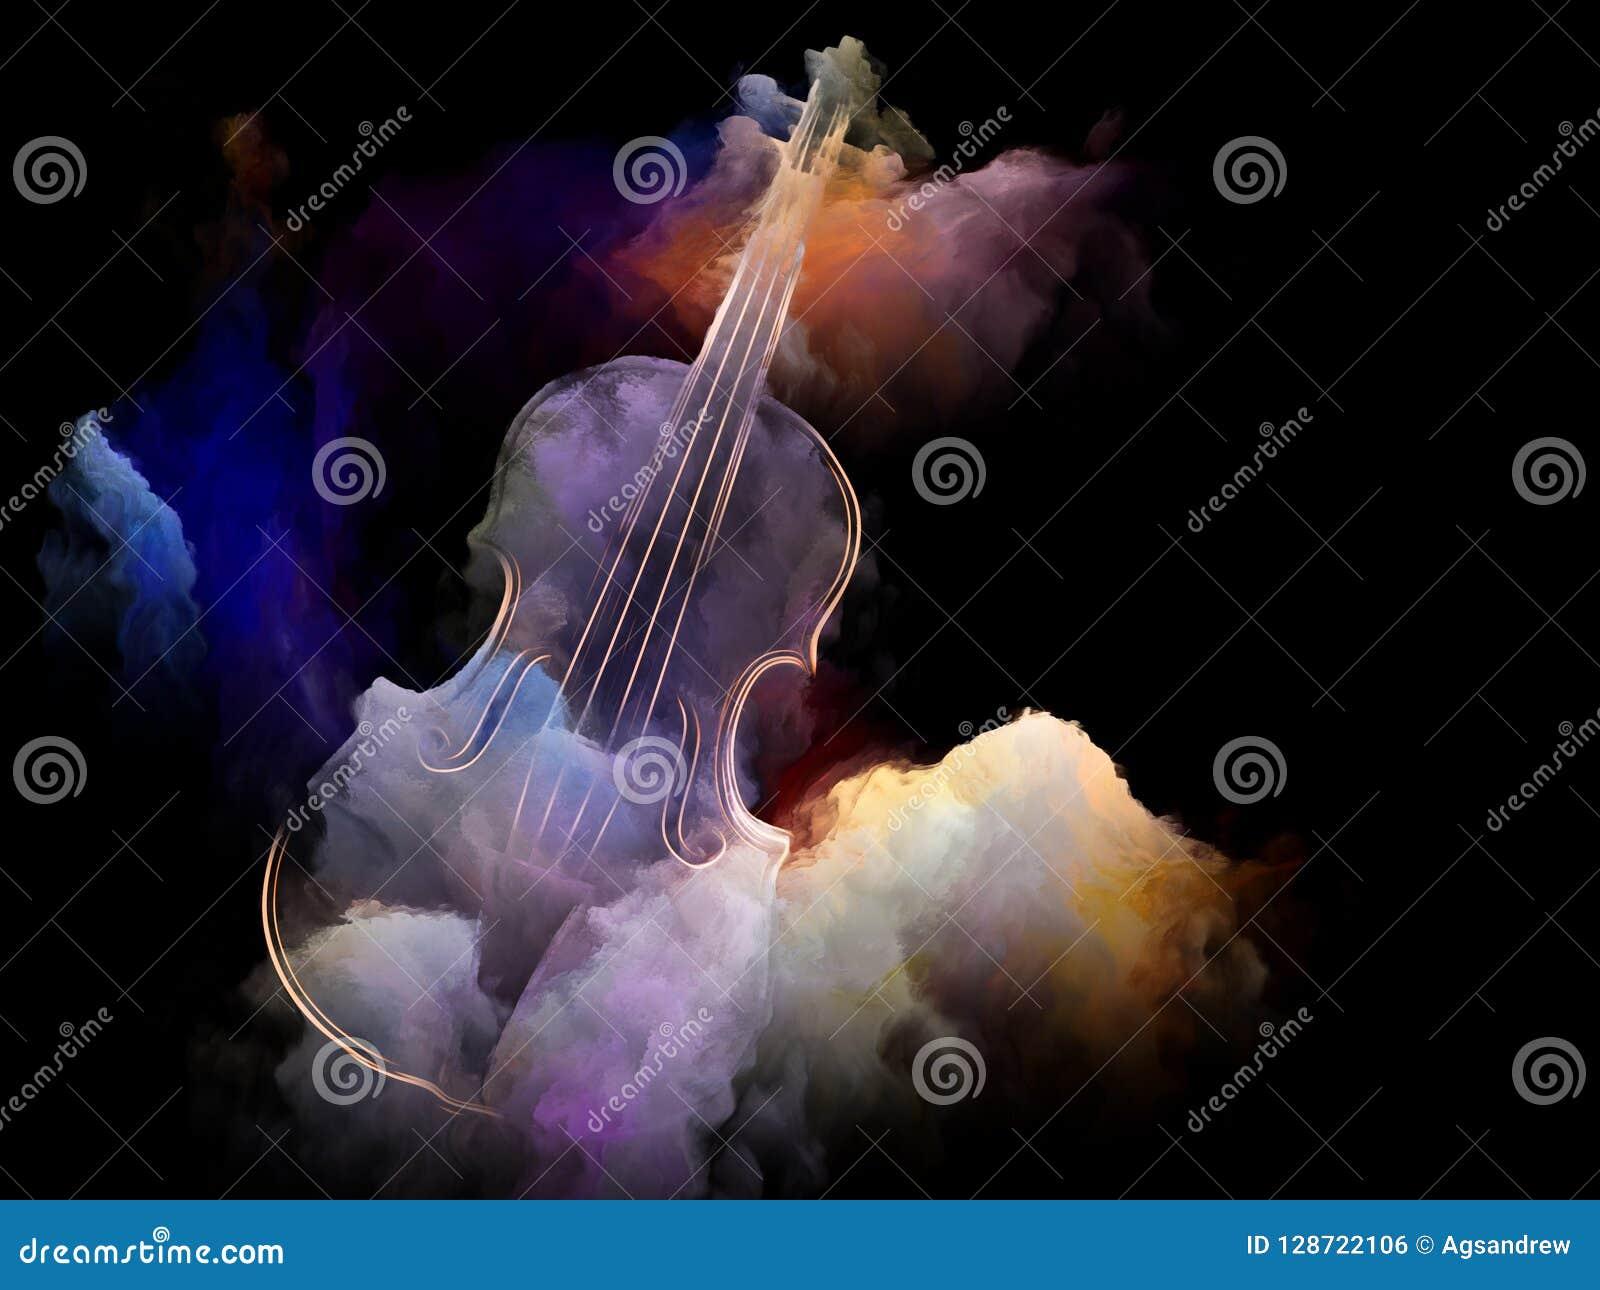 Dreams of Old Violin stock illustration  Illustration of